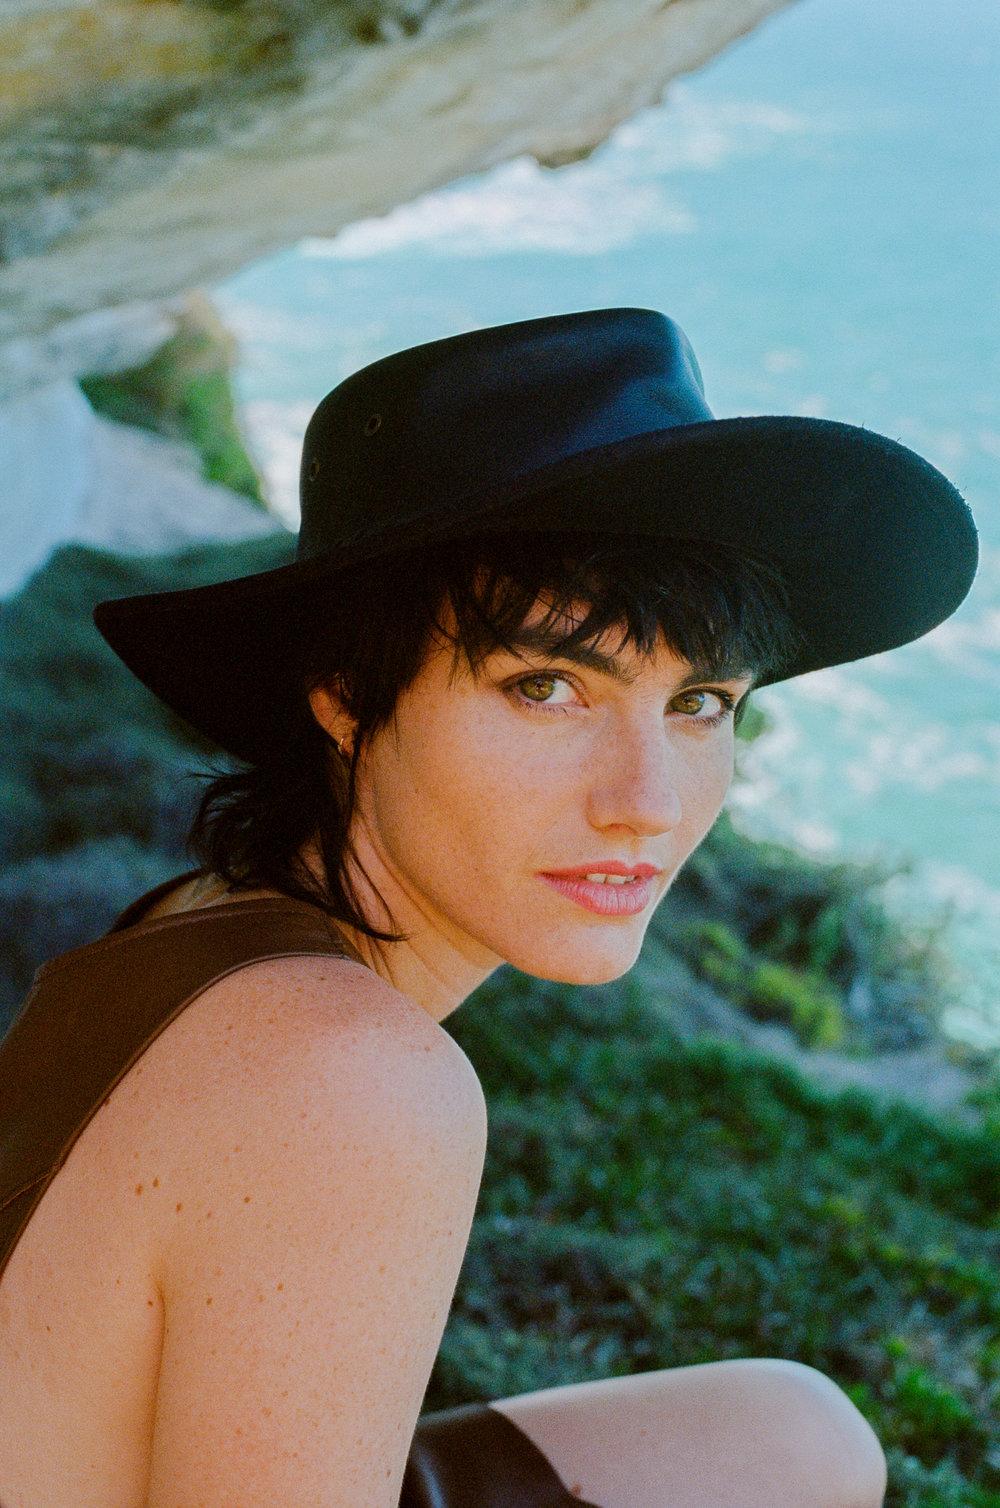 Isabella Manfredi by Simone2.jpg